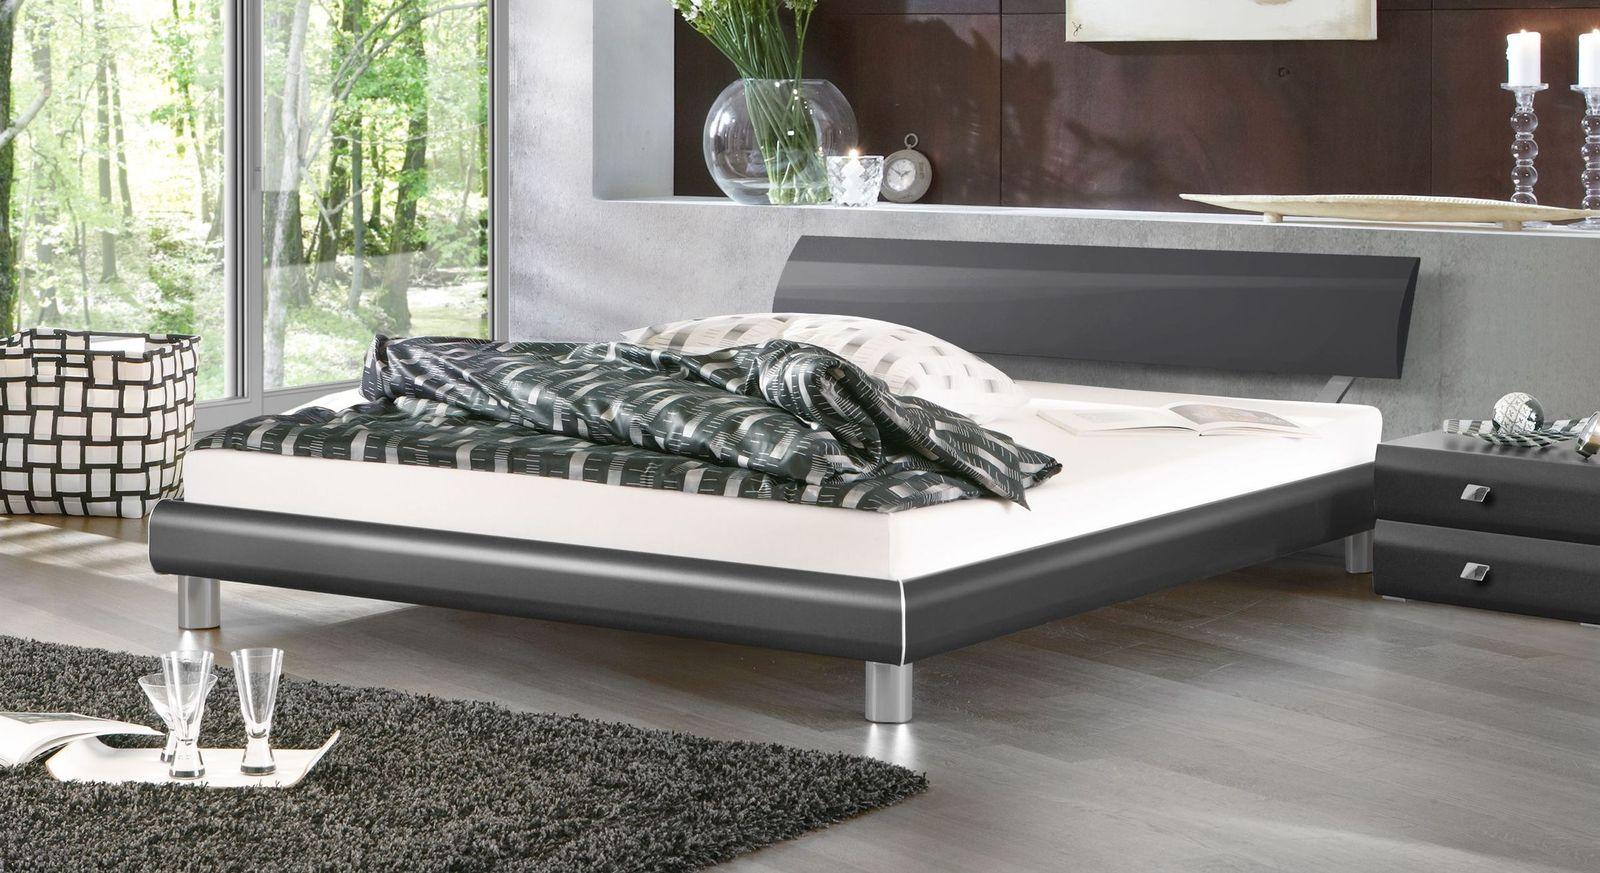 Bett Novara aus anthrazitfarbenem Dekor